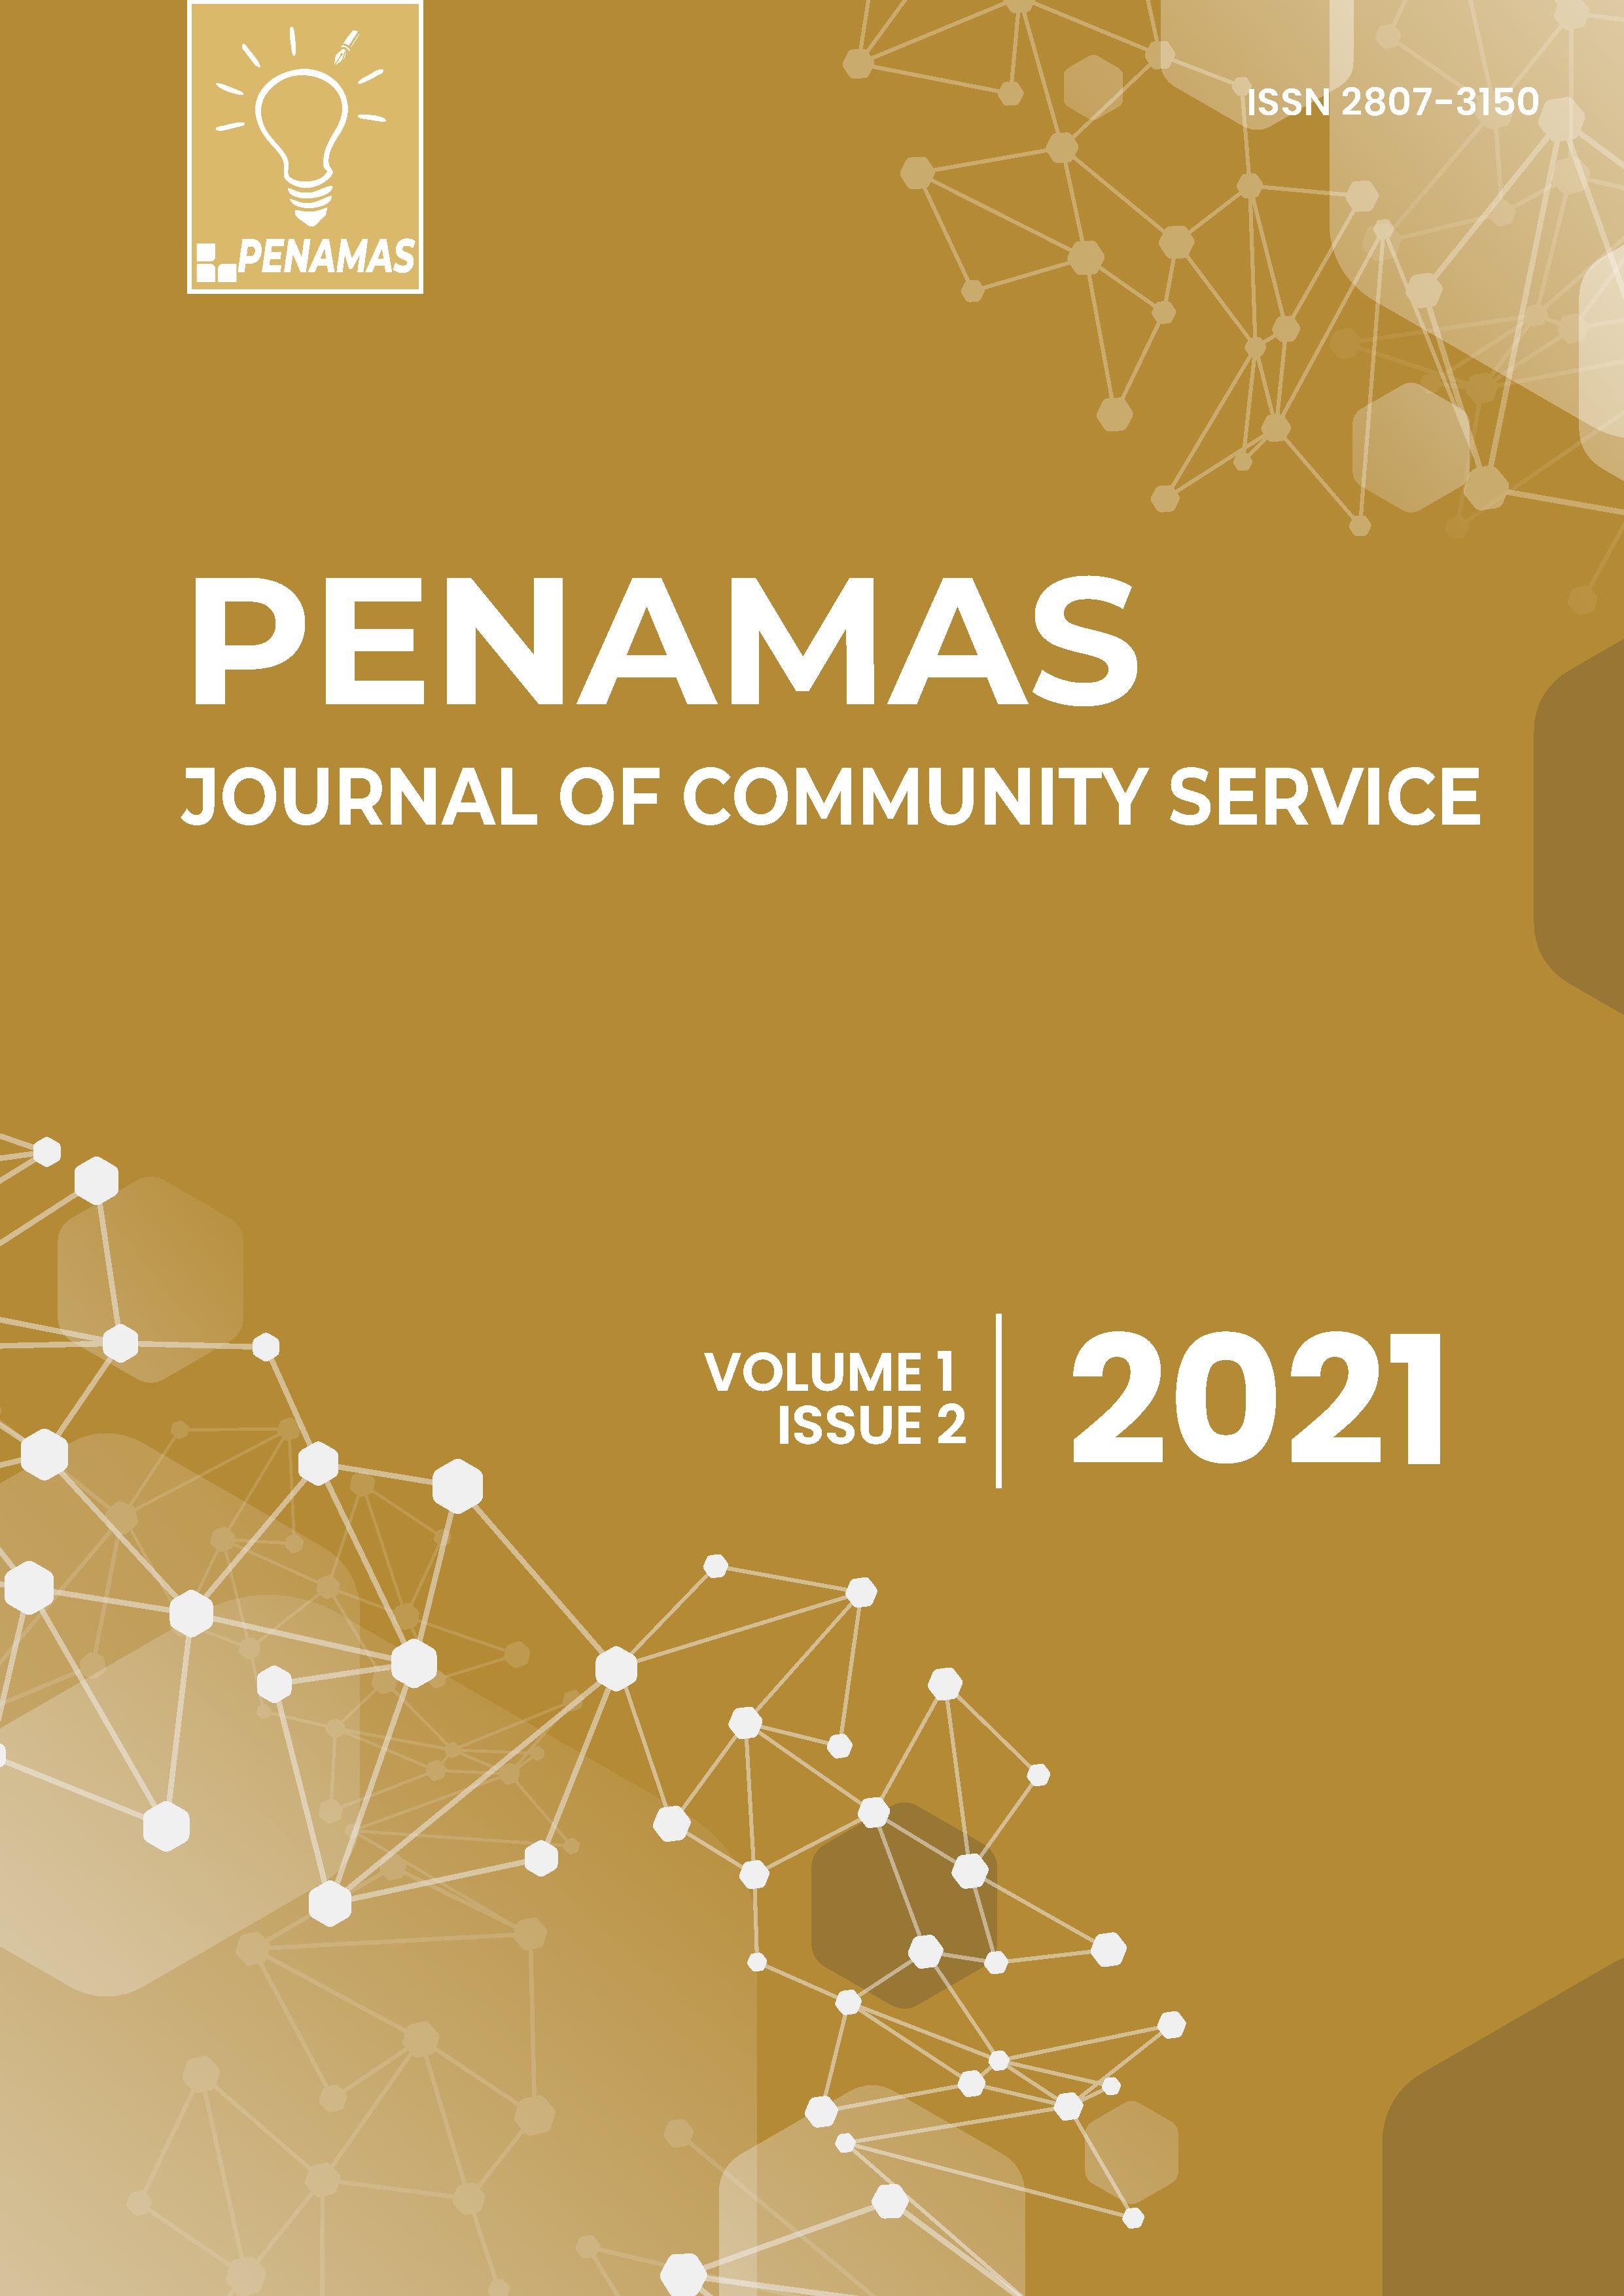 View Vol. 1 No. 2 (2021): Penamas: Journal of Community Service (In Press)